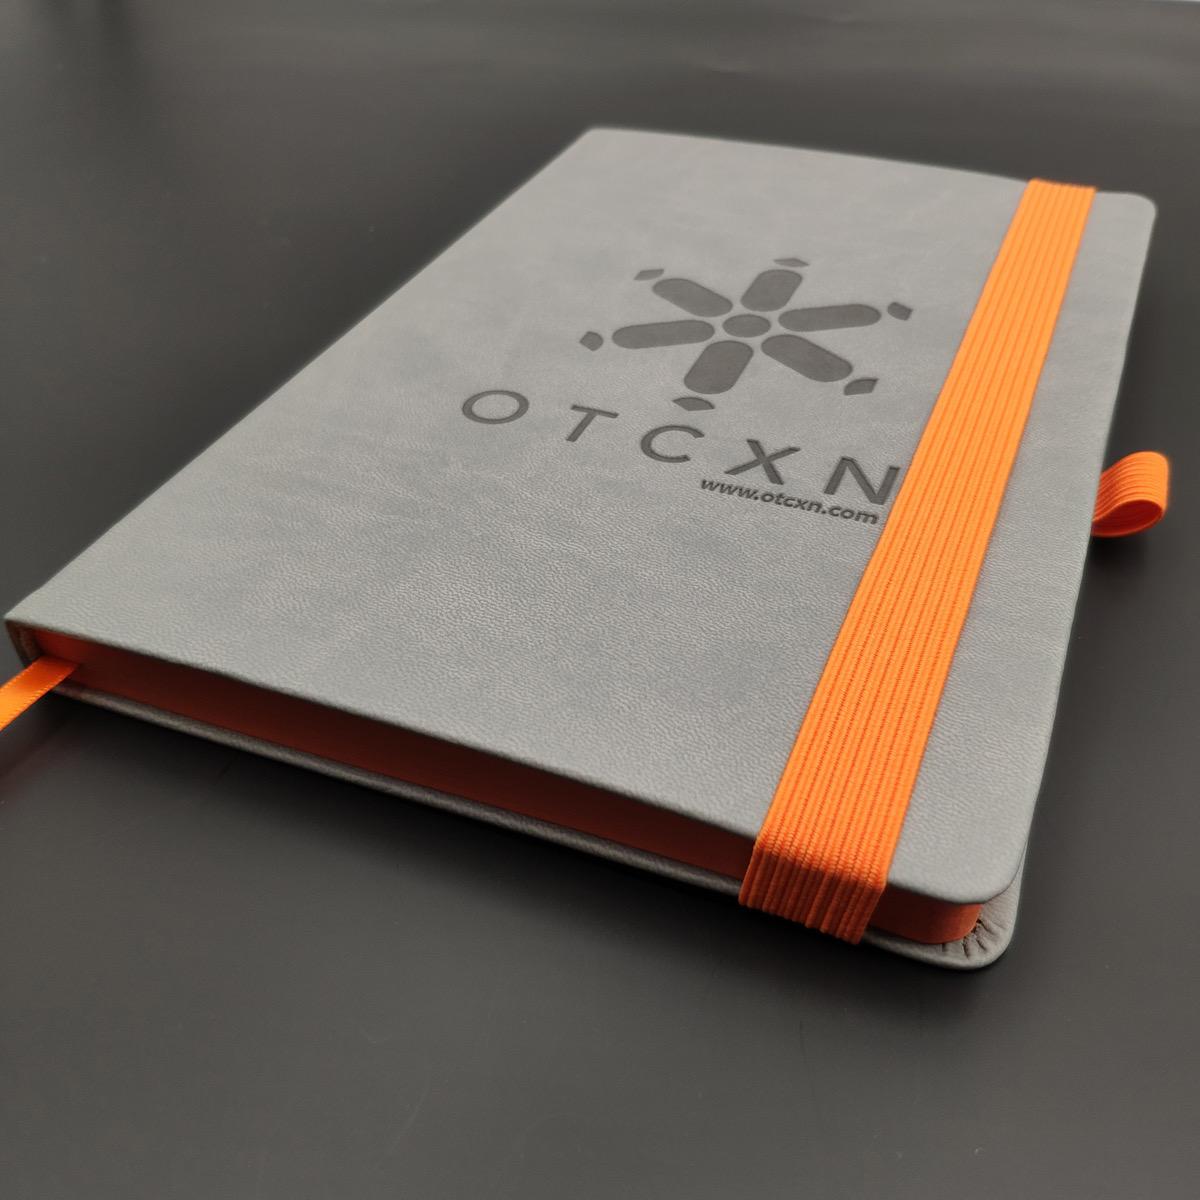 Grey_Book_OTCXN_Misk1.2.jpeg